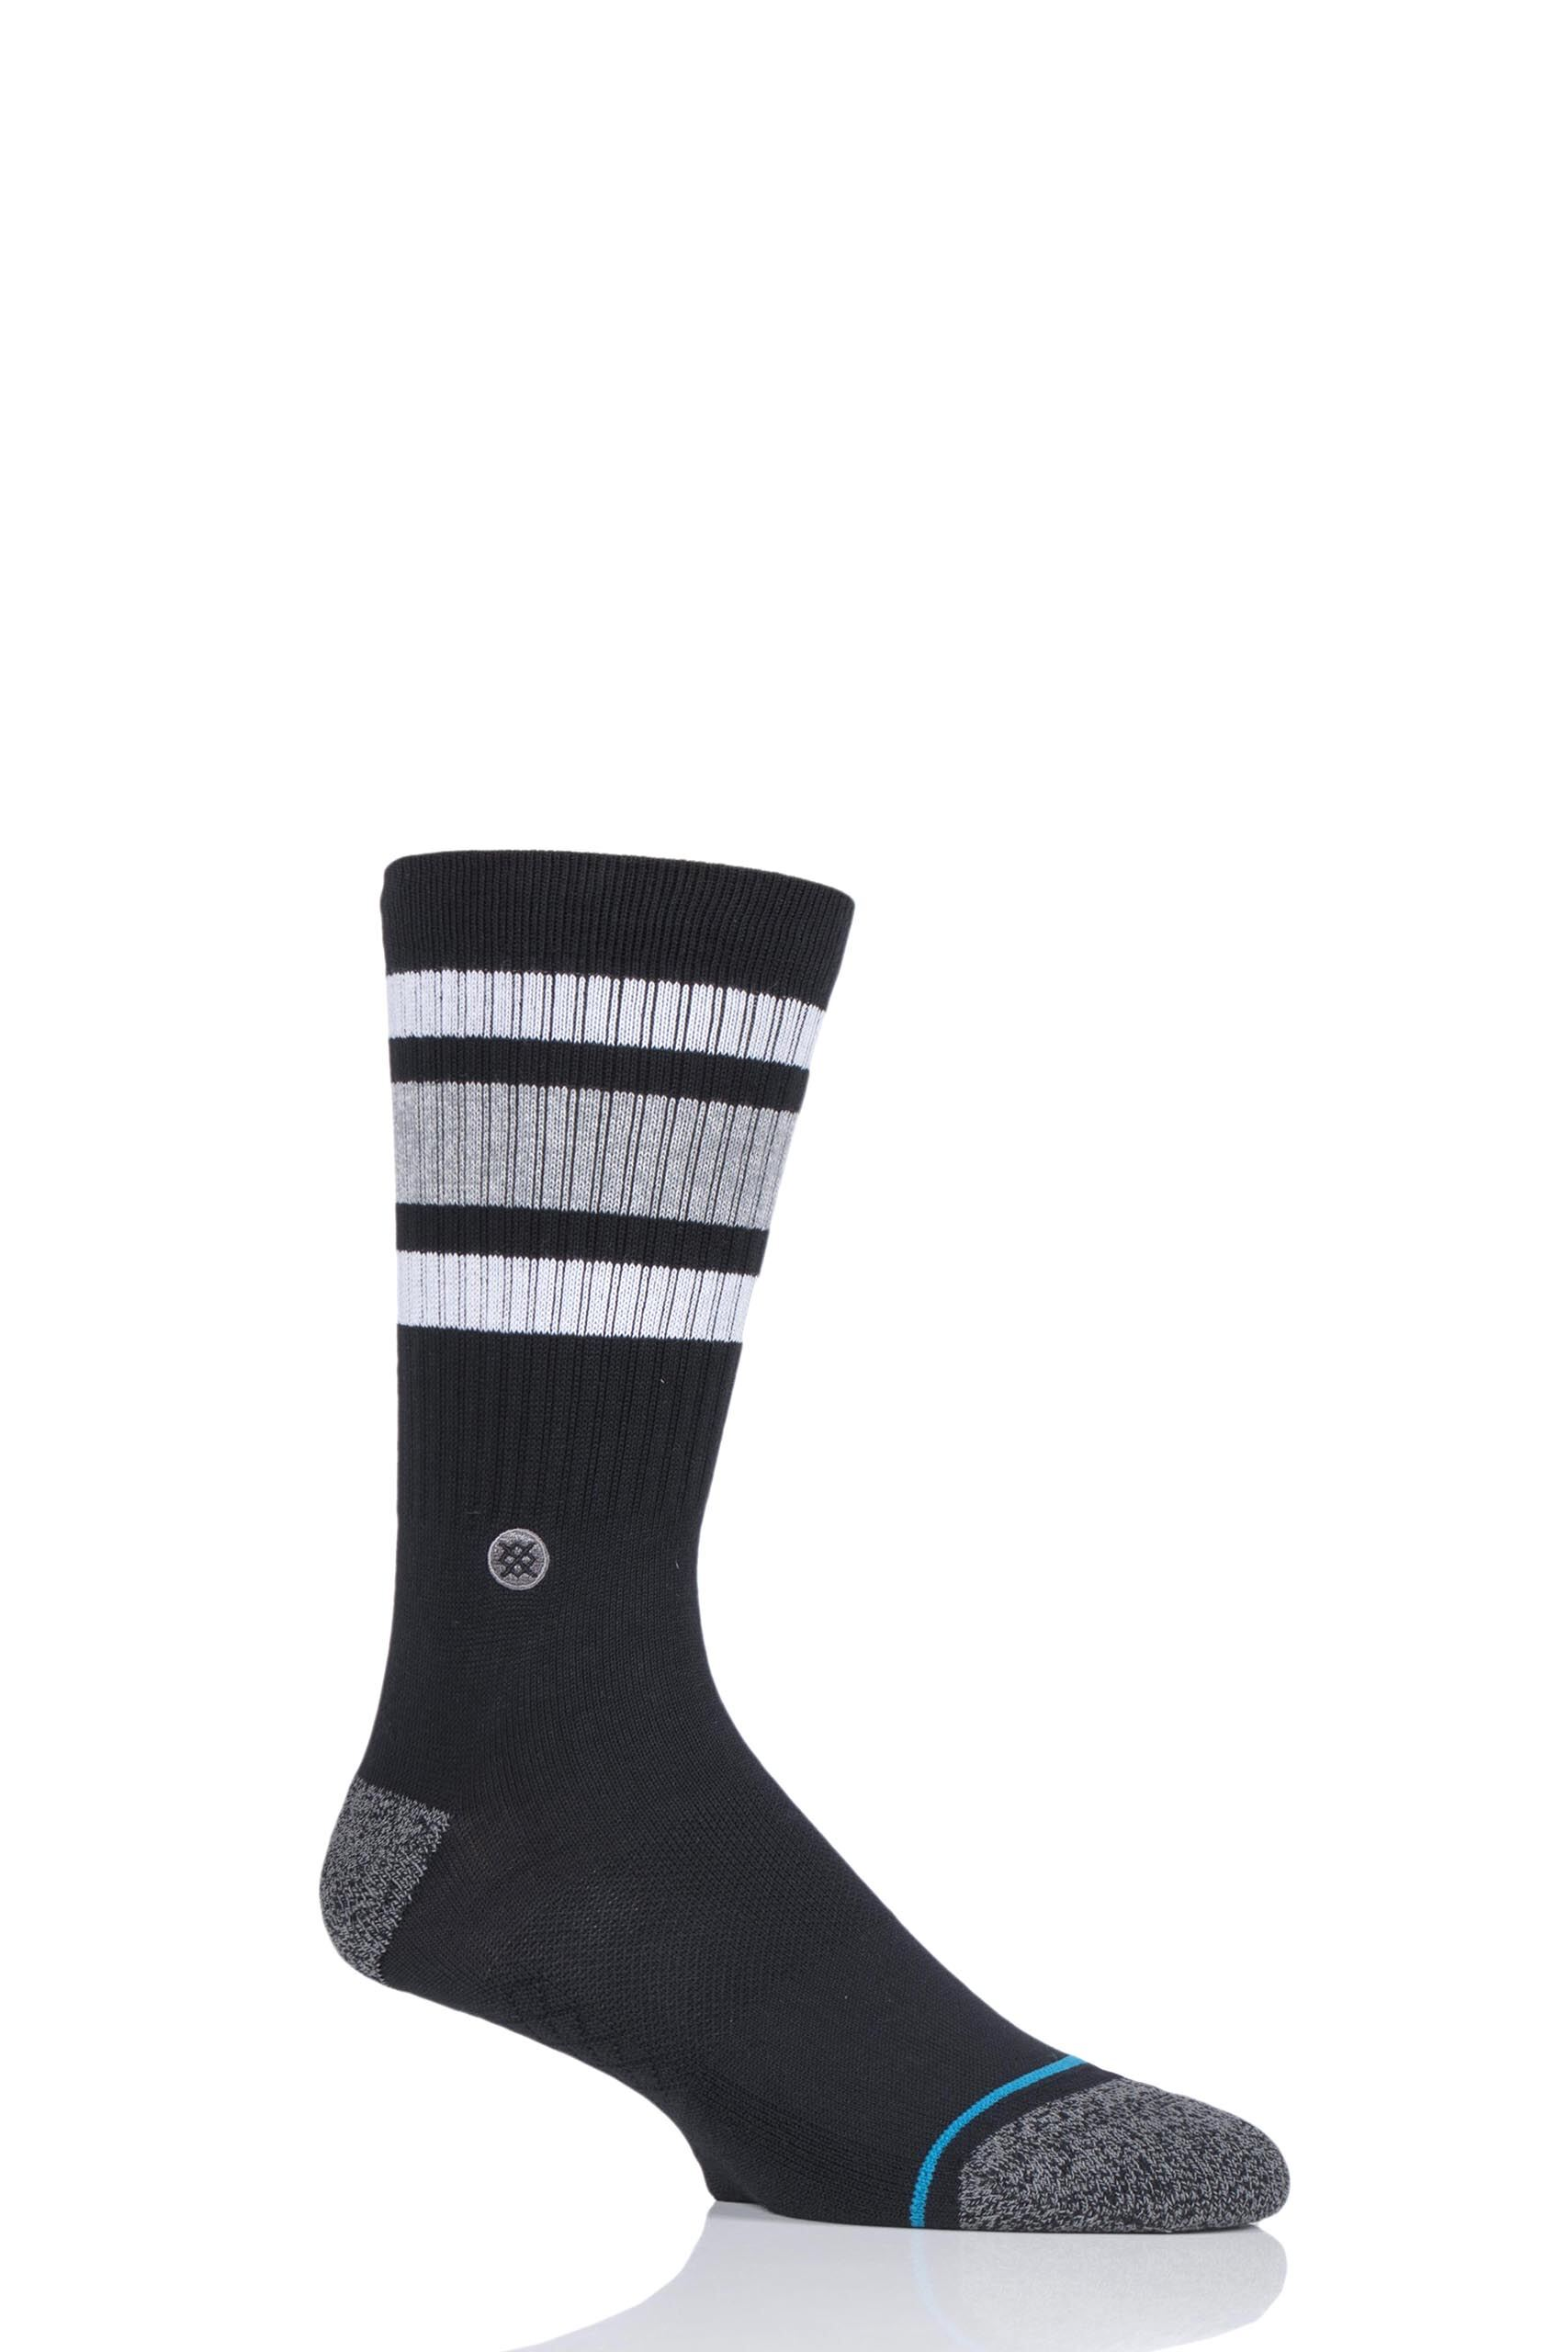 Image of 1 Pair Black Boyd St Cotton Socks Unisex 3-5.5 Ladies - Stance